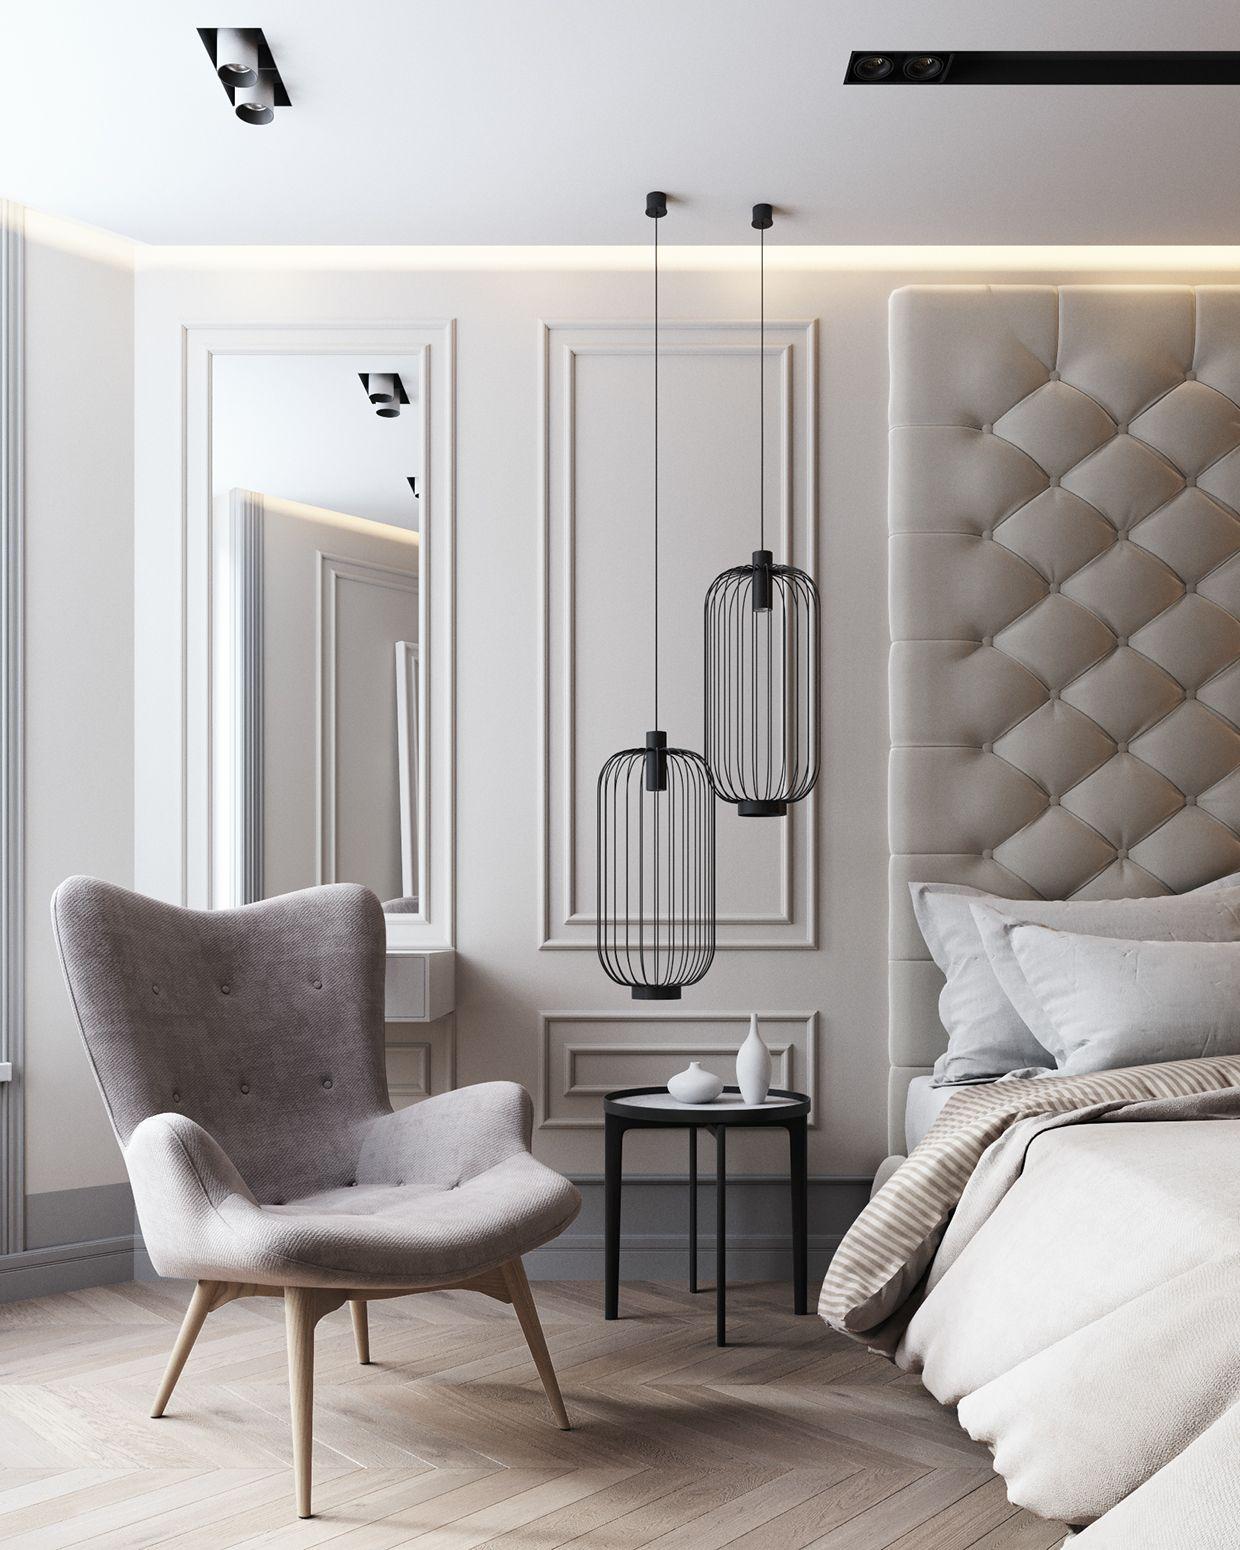 Classic Modern Bedroom Interior Design